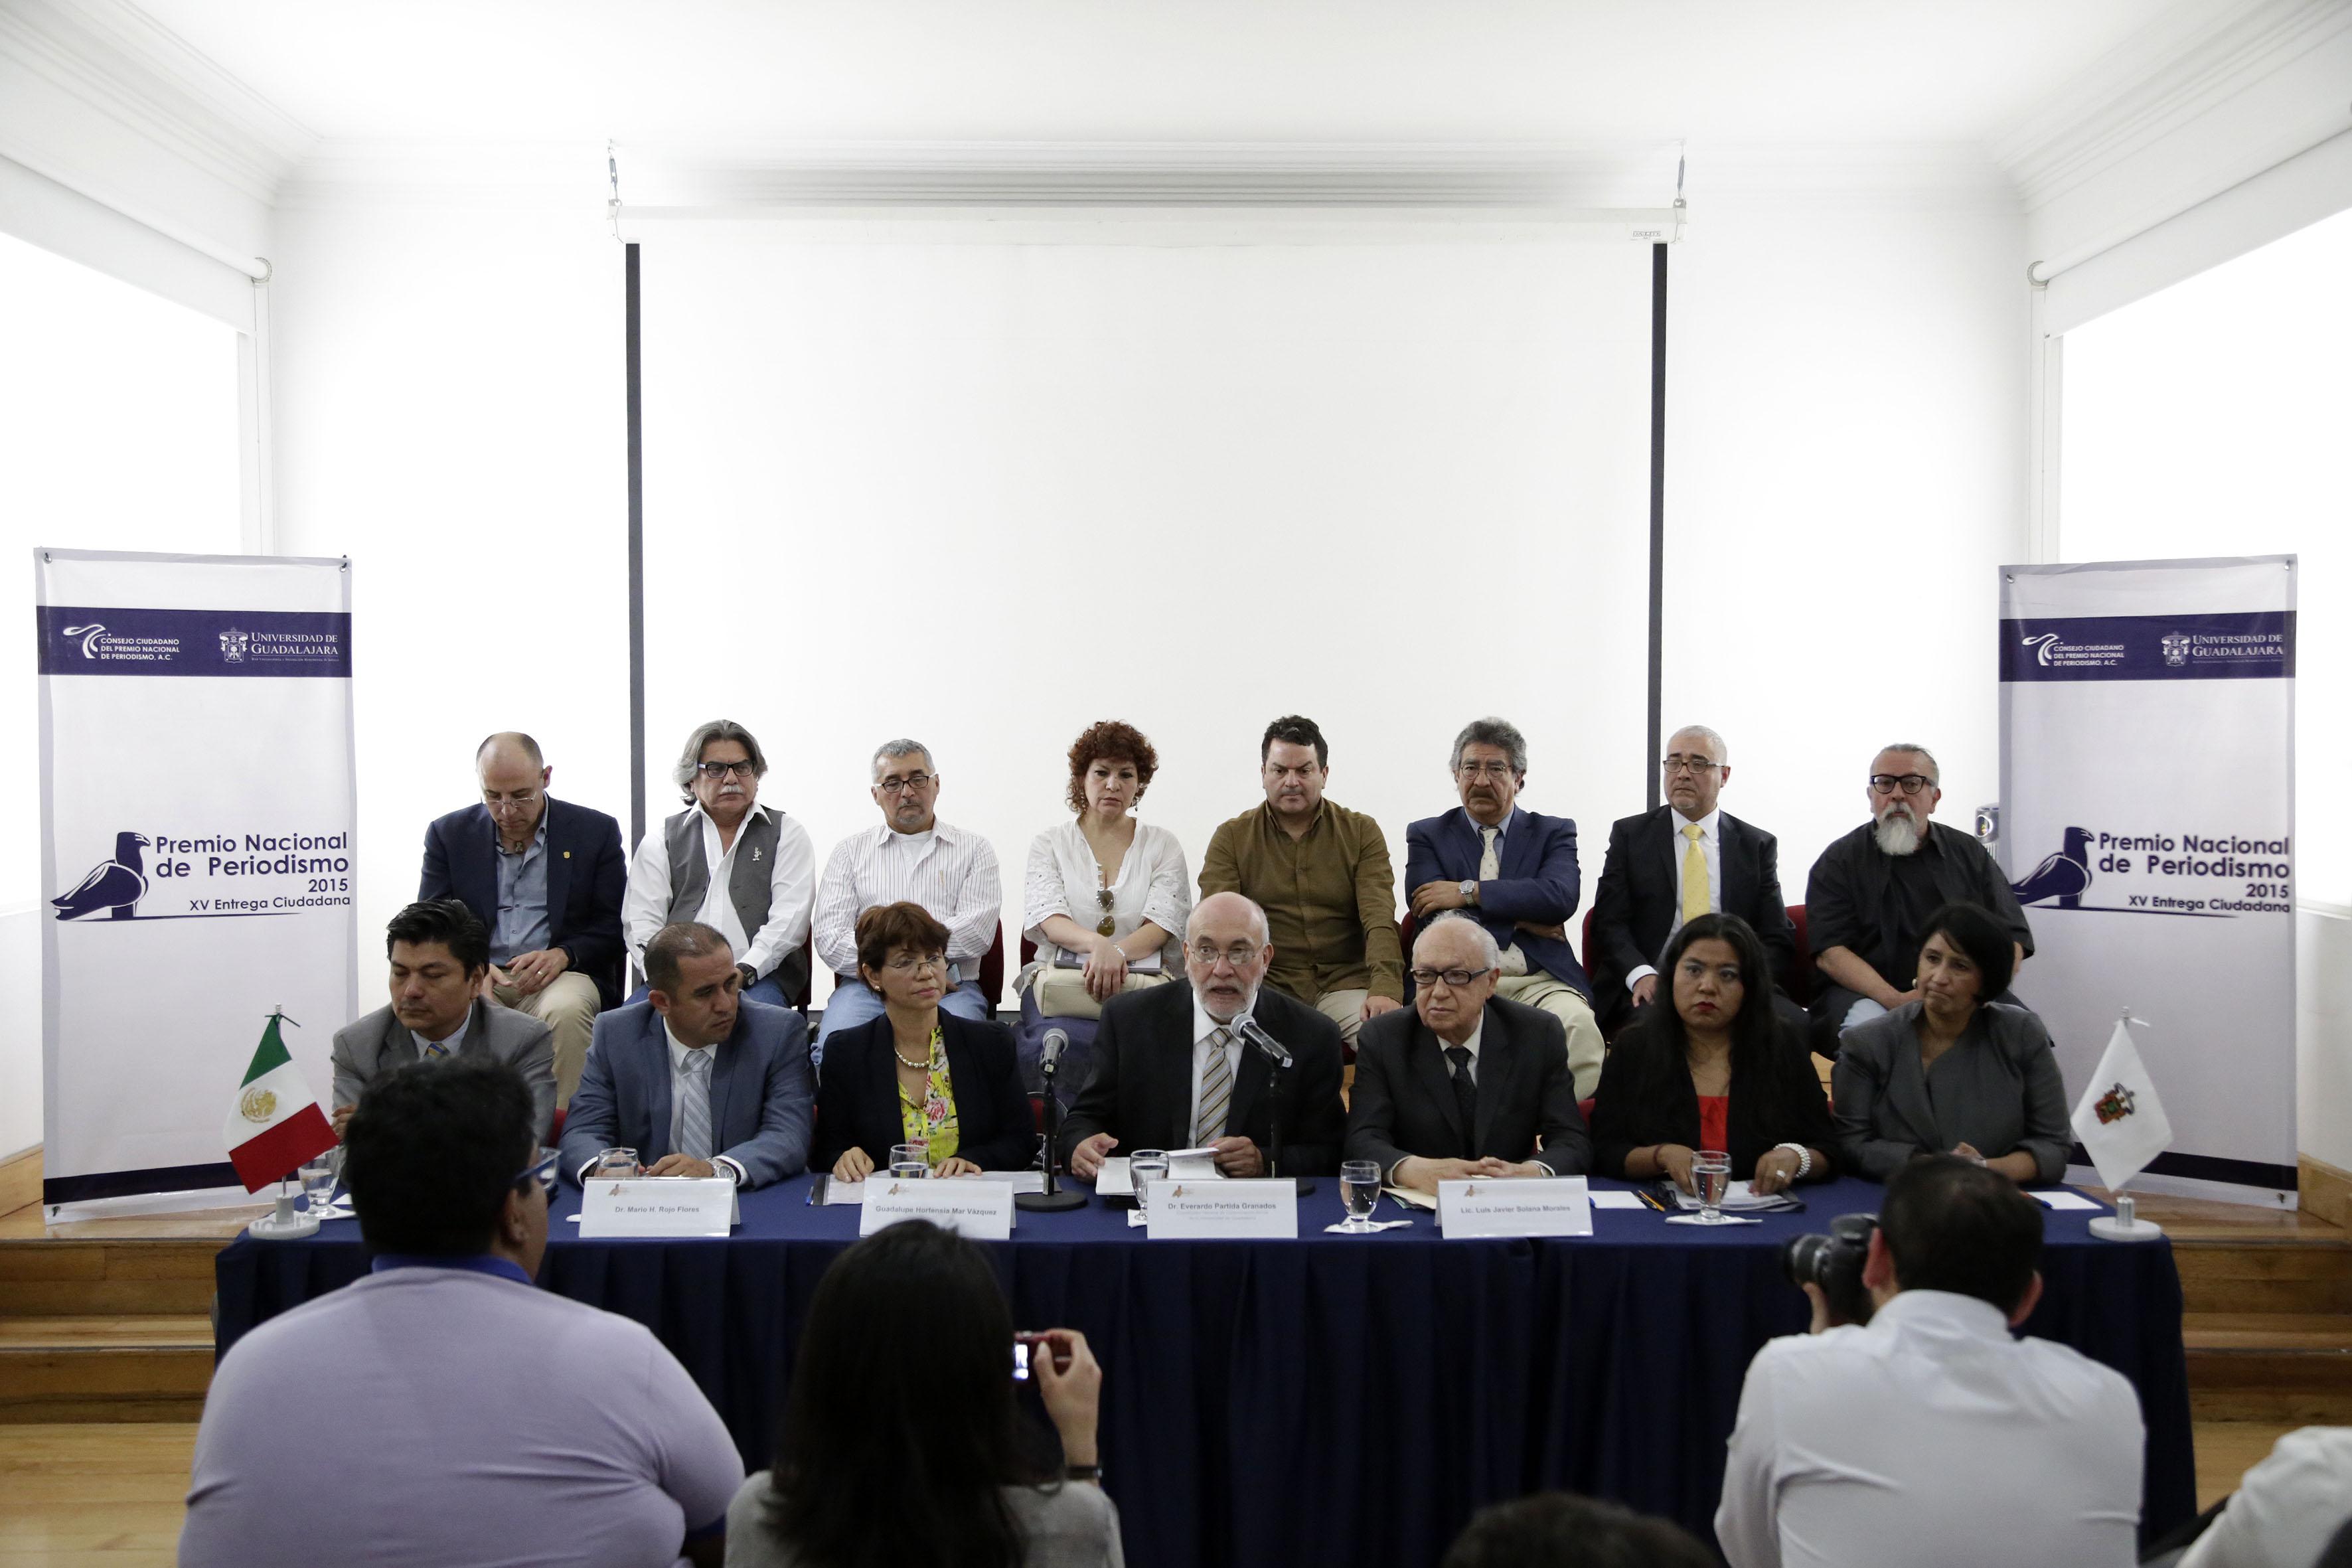 Conferencia de prensa, para anunciar convocatoria para participar en Premio Nacional de Periodismo 2015